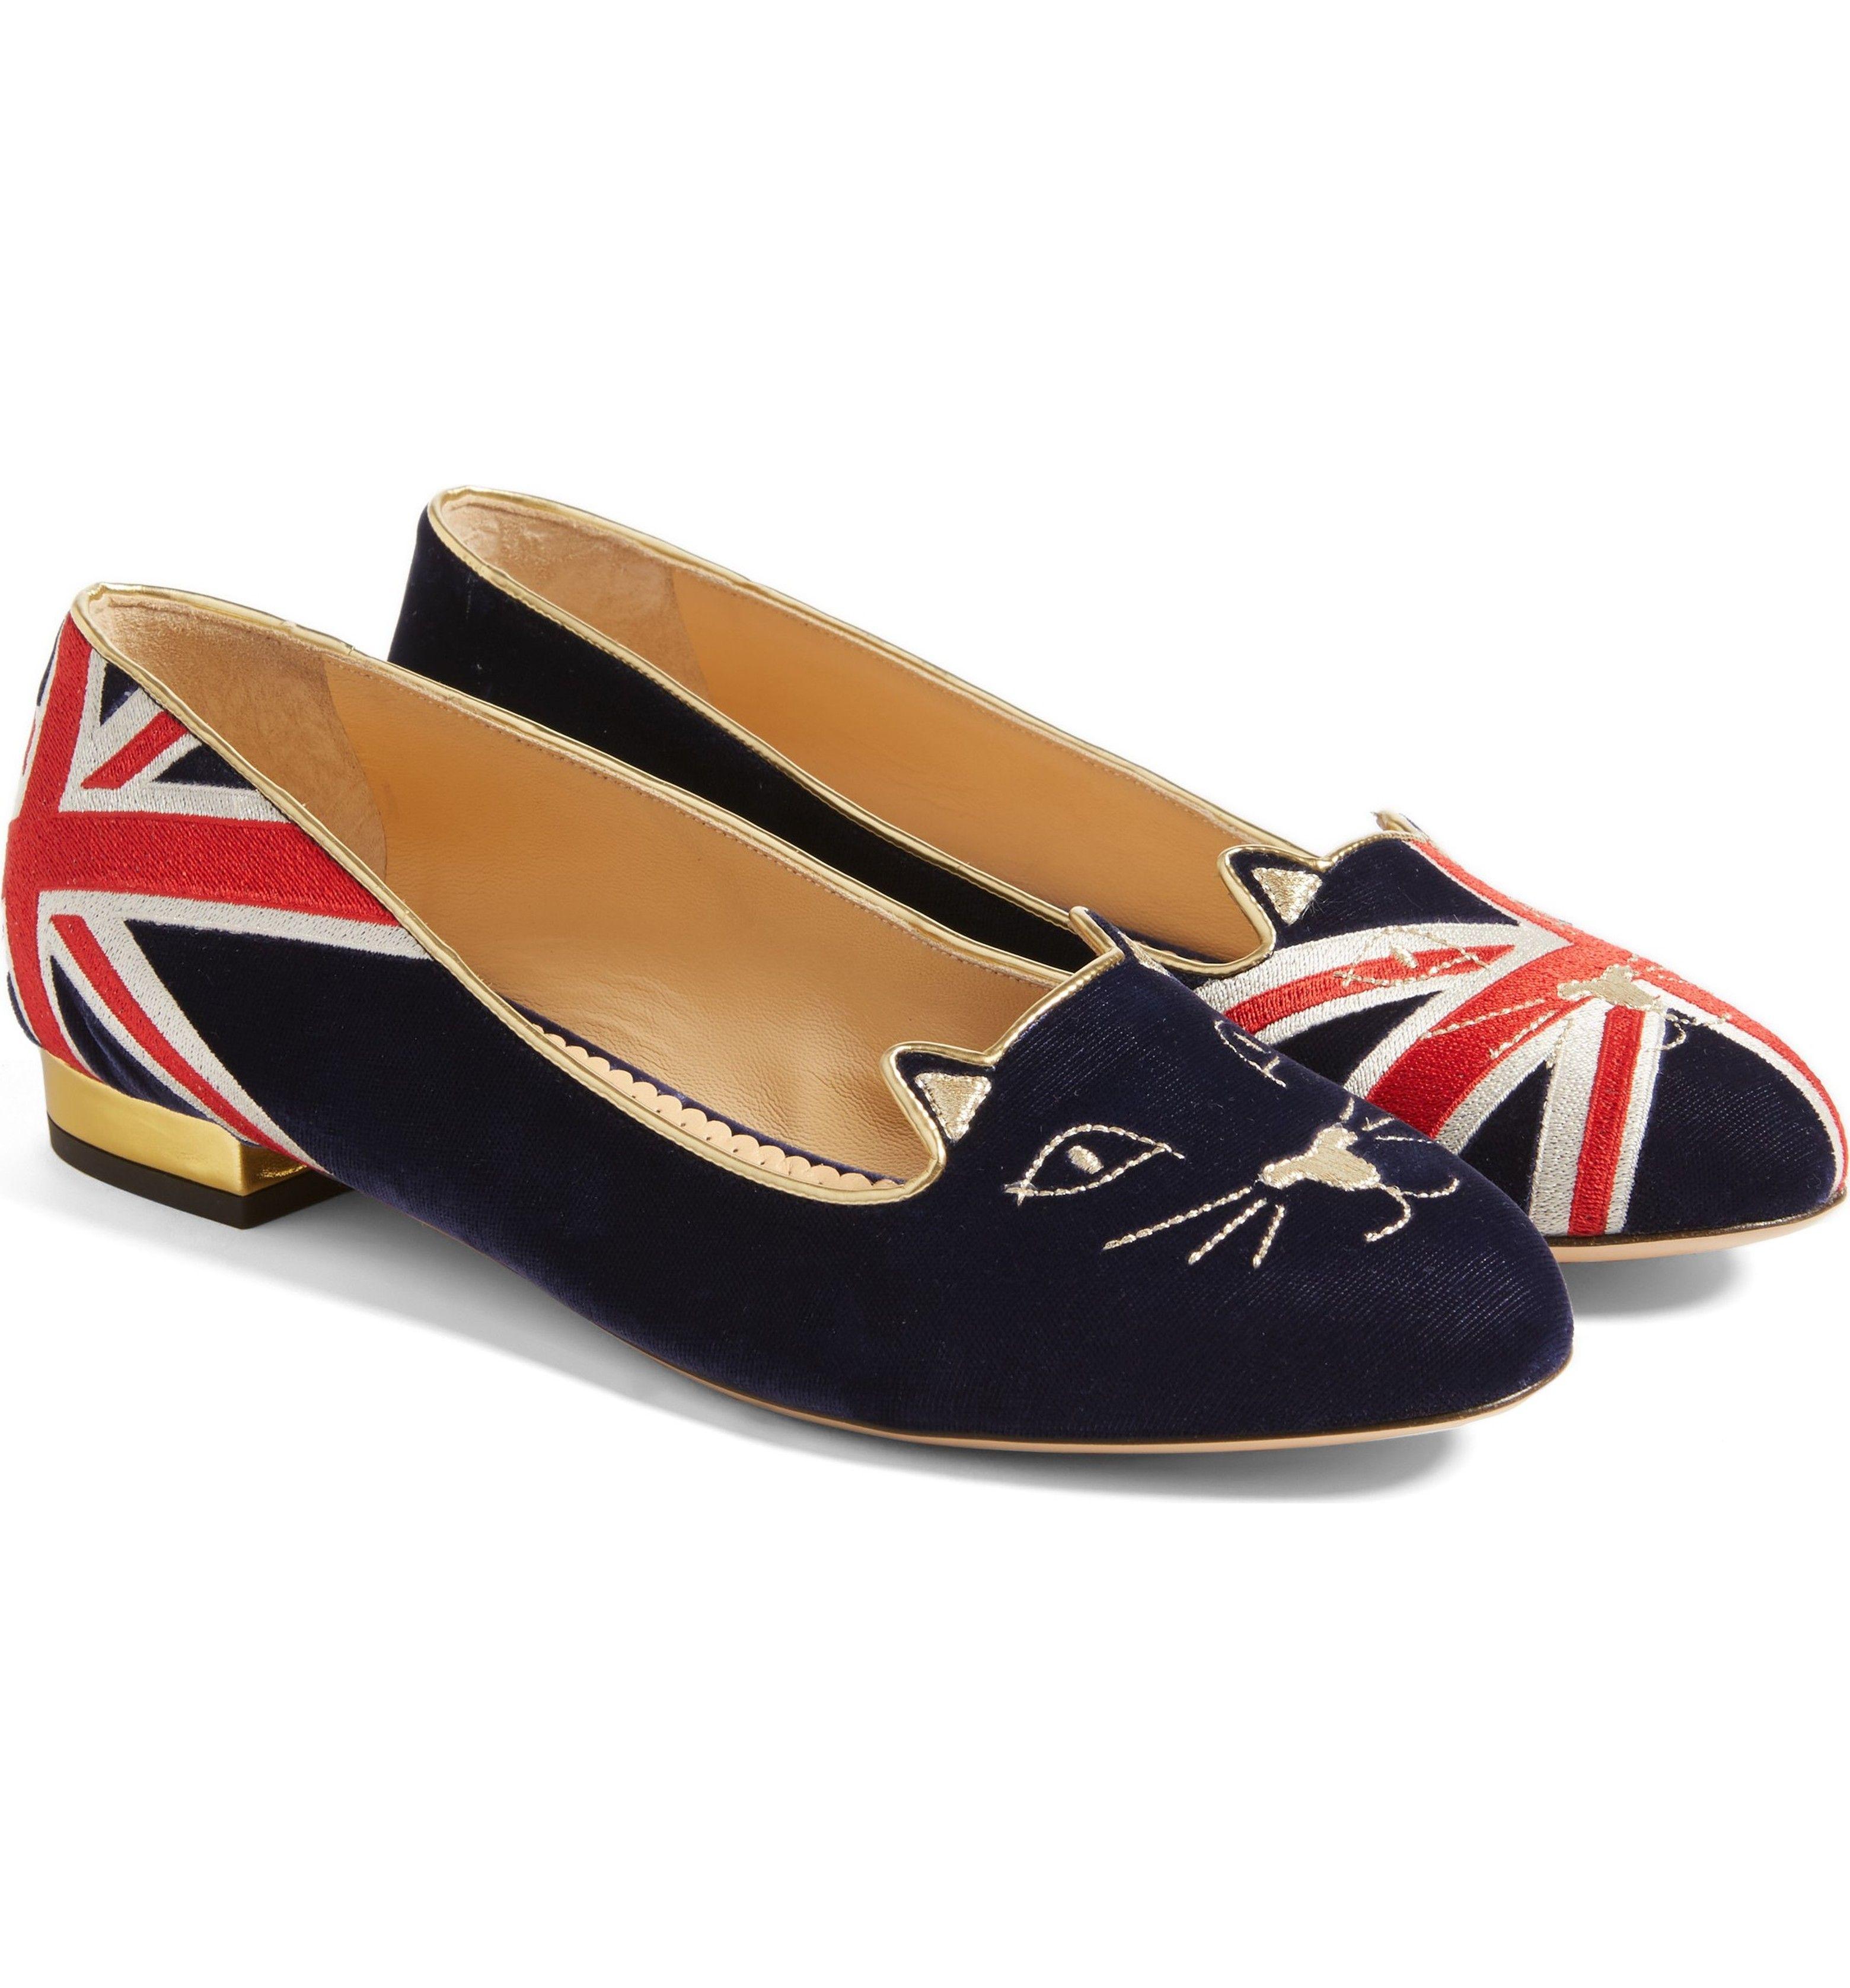 e92a8f7b0dd5b Main Image - Charlotte Olympia Great Britain Kitty Flat (Women ...